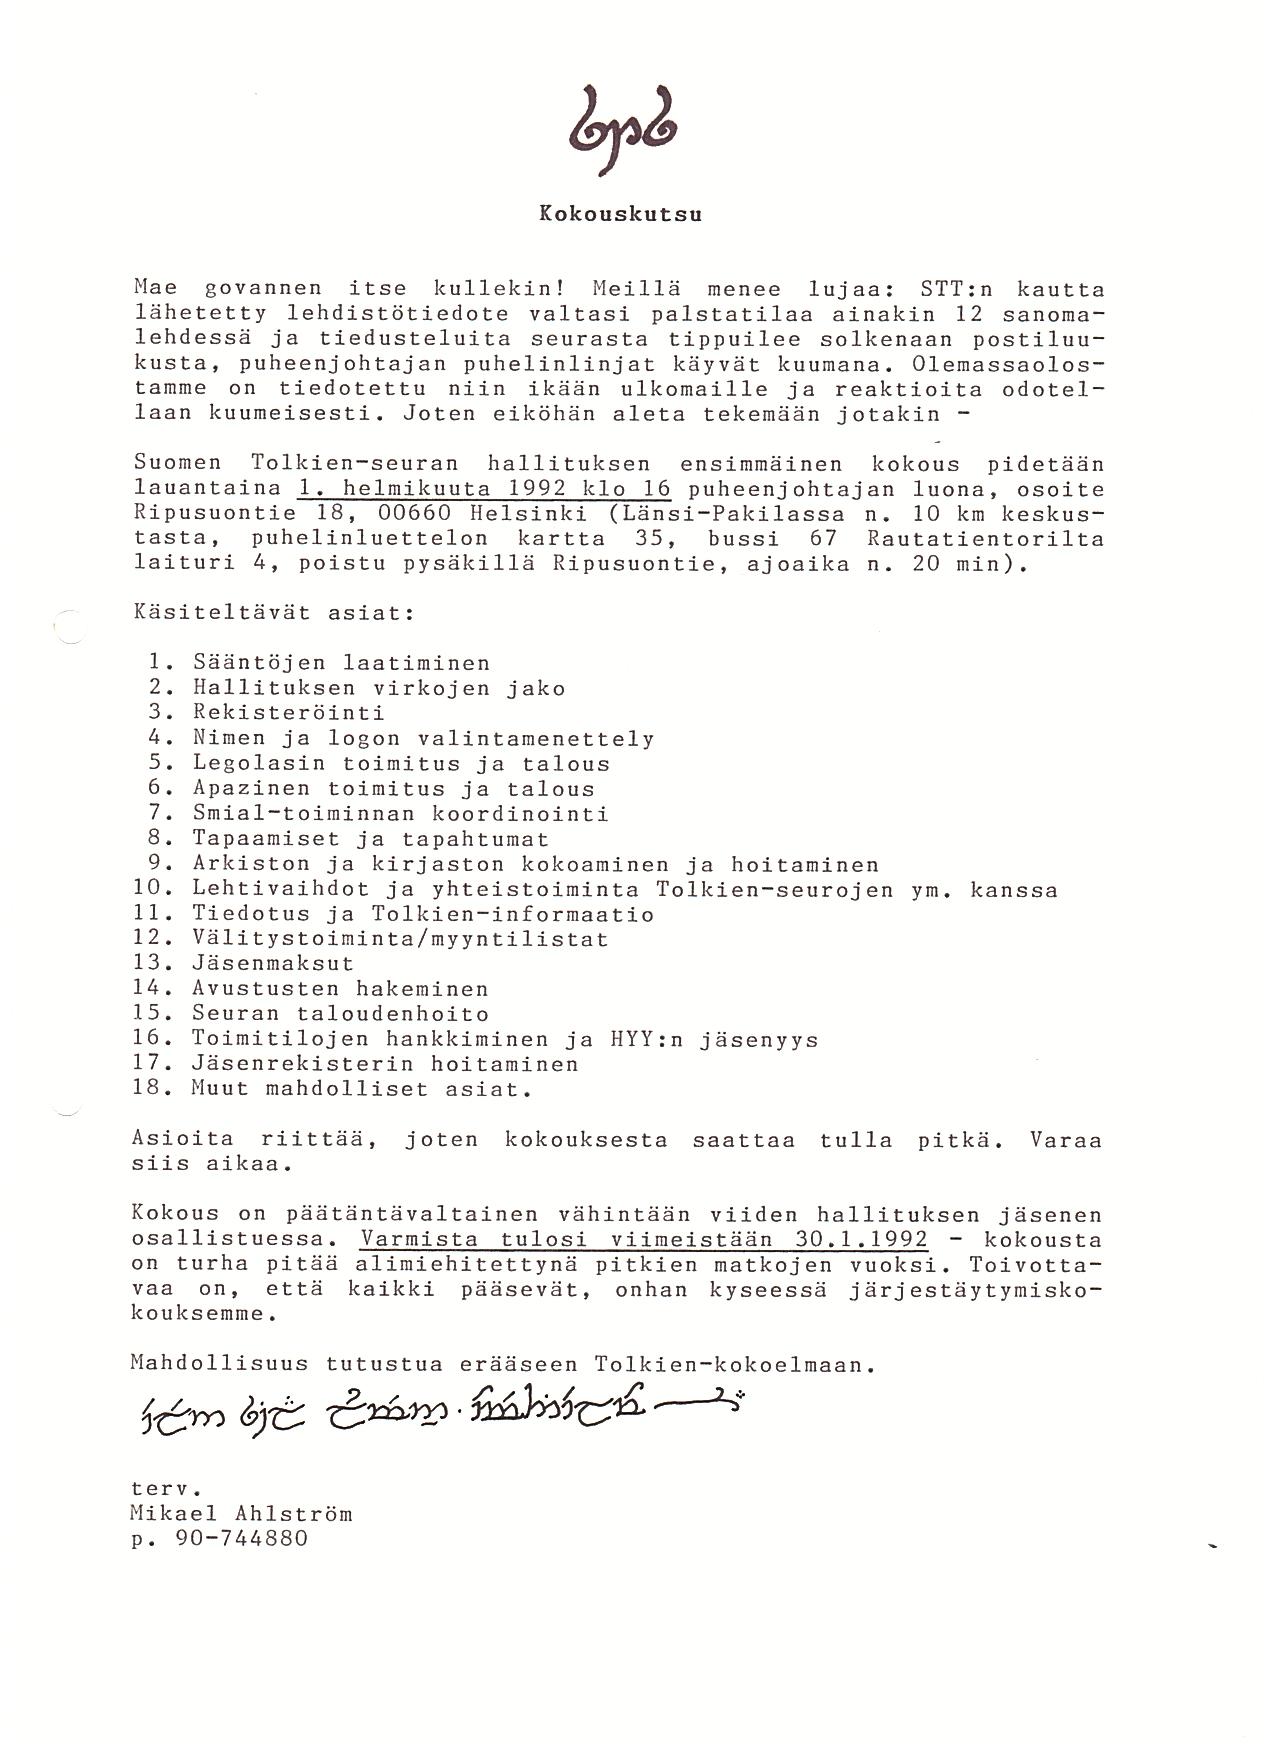 1992-02-01_kokouskutsu